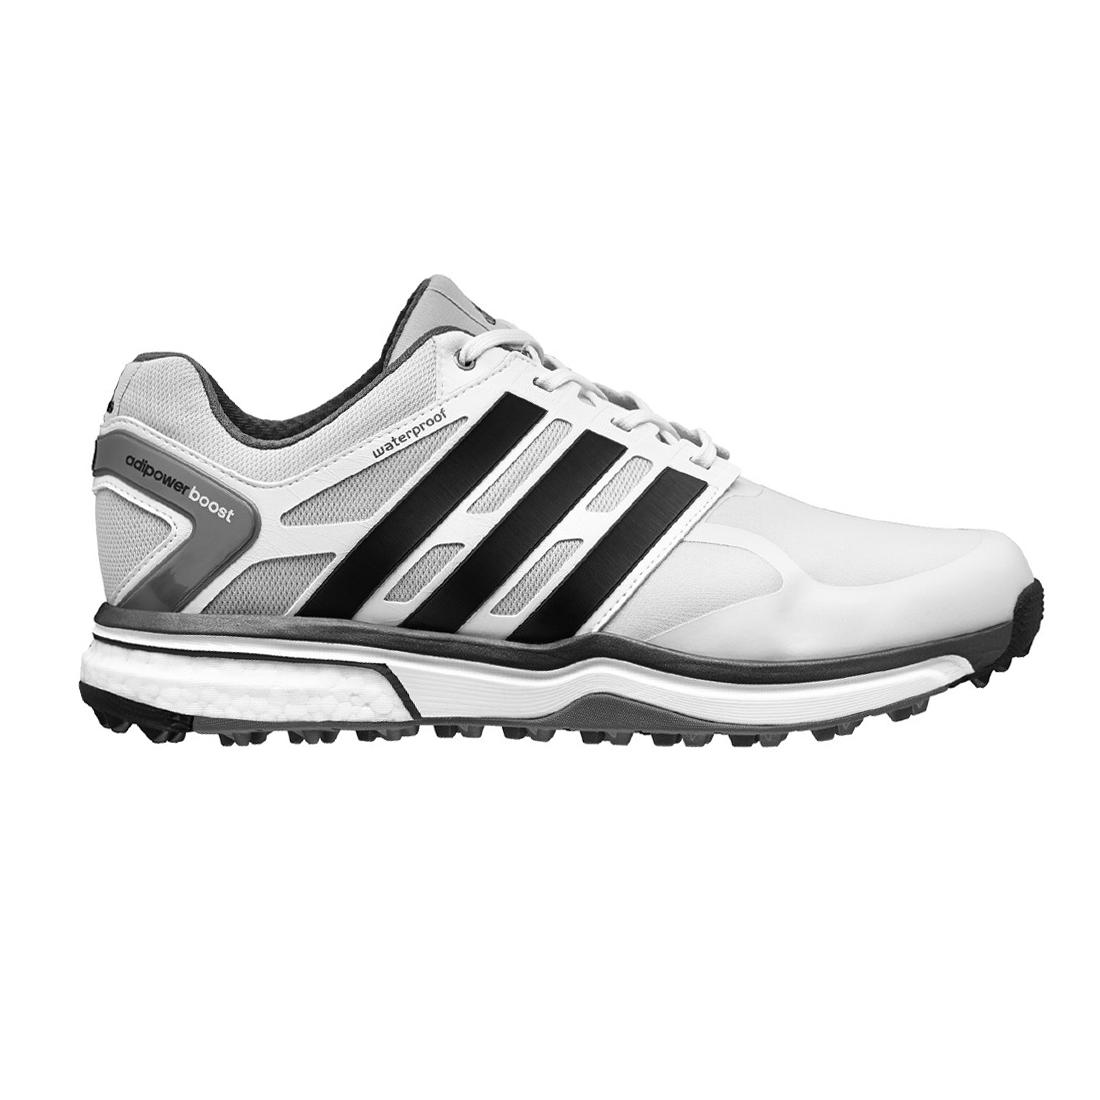 Buy Adidas AdiPower Sport Boost Golf